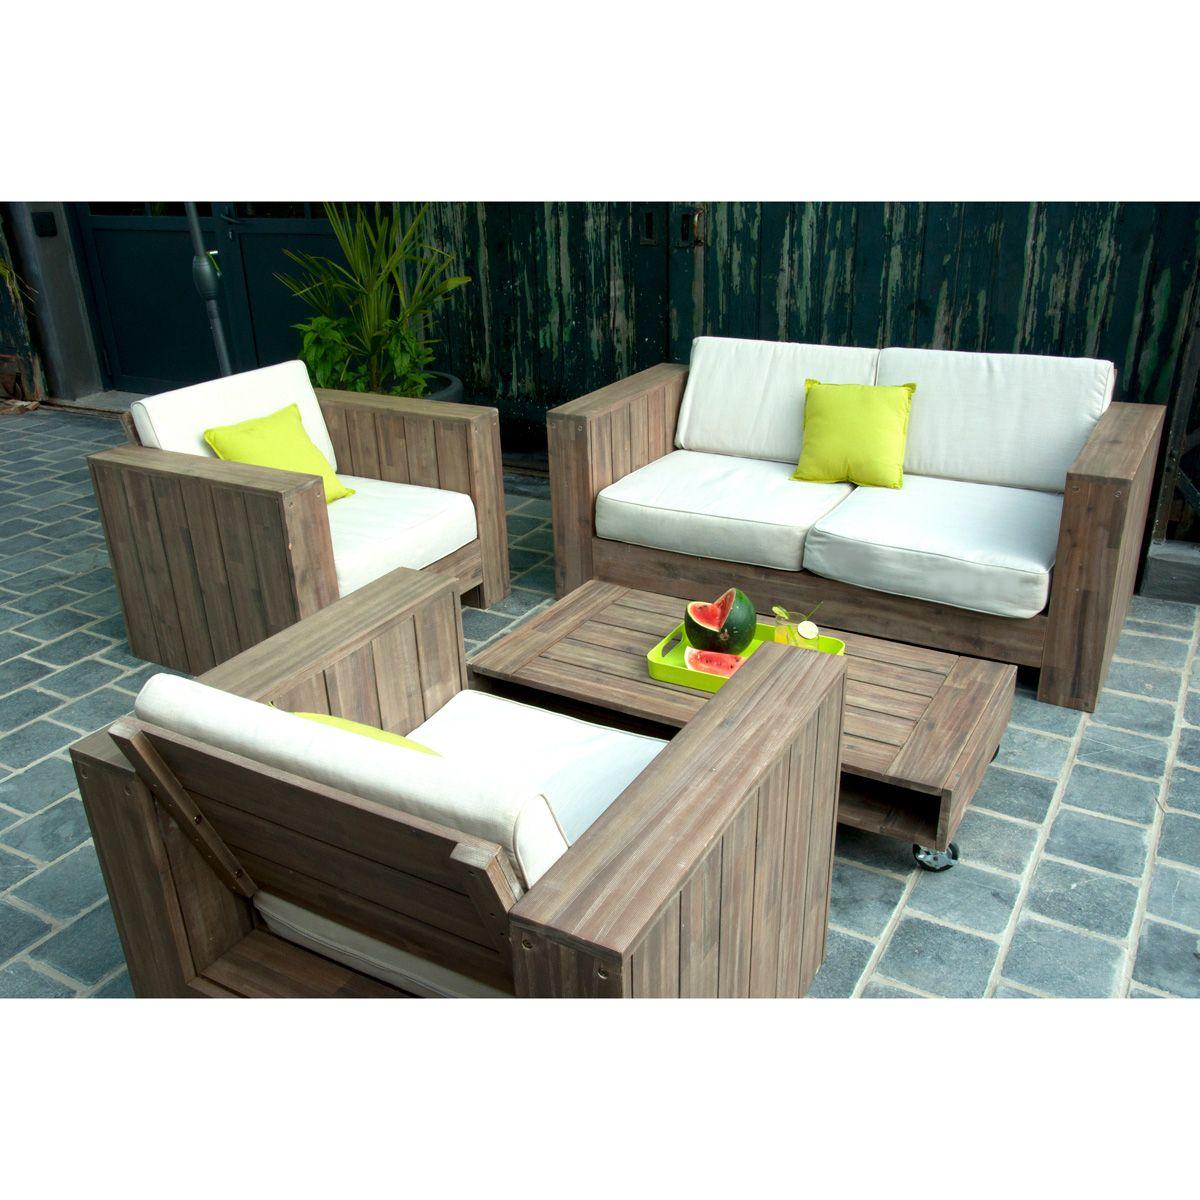 impressionnant salon de jardin rond pas cher | Table de jardin ...